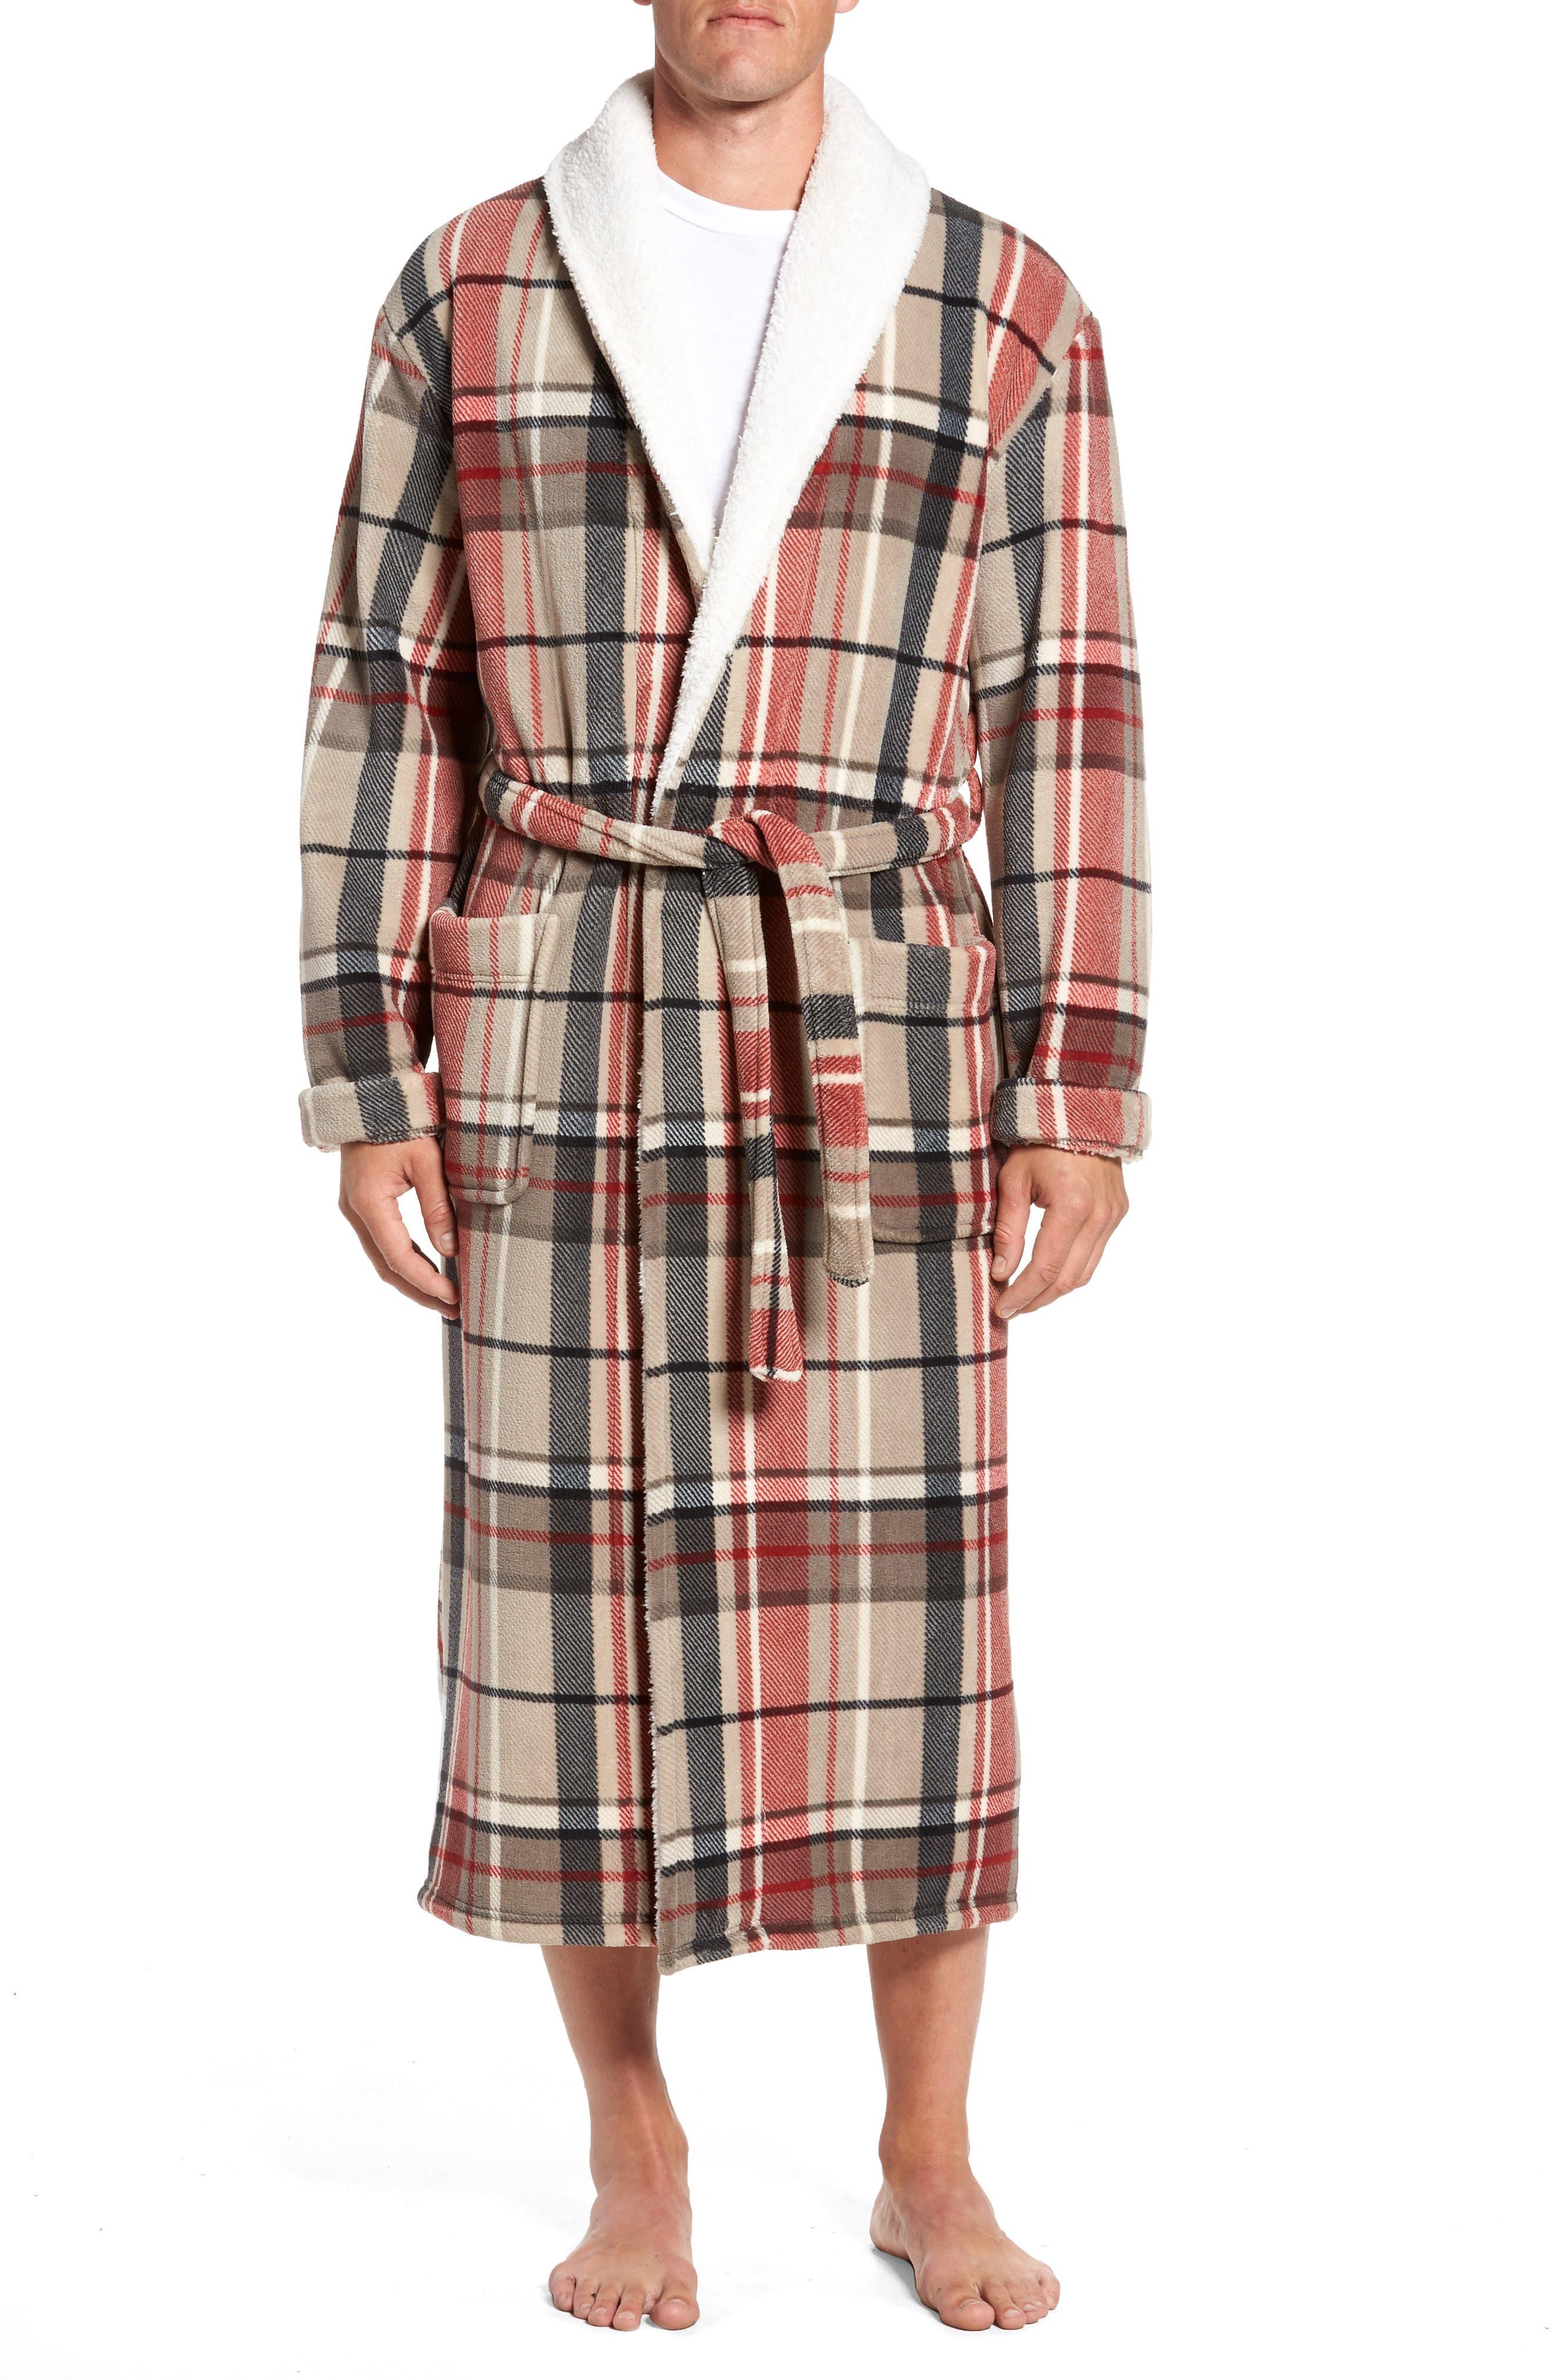 Main Image - Majestic International Holly Jolly Robe